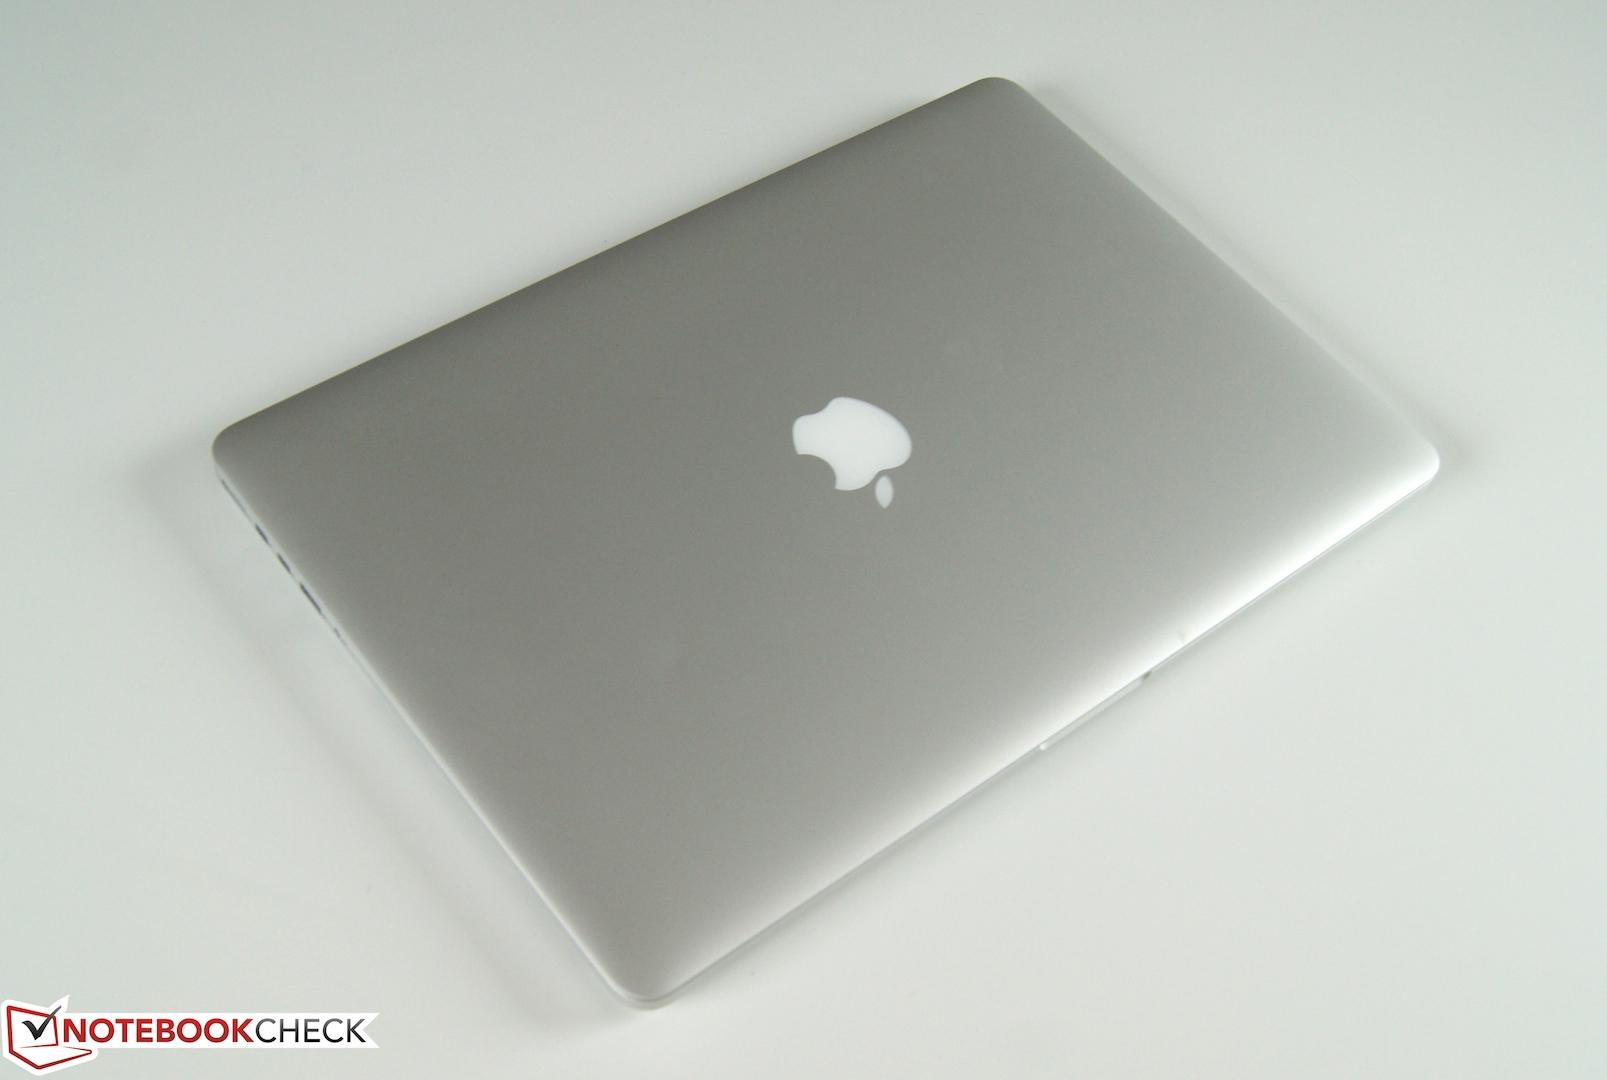 critique compl te du pc portable apple macbook pro retina 15 fin 2013. Black Bedroom Furniture Sets. Home Design Ideas